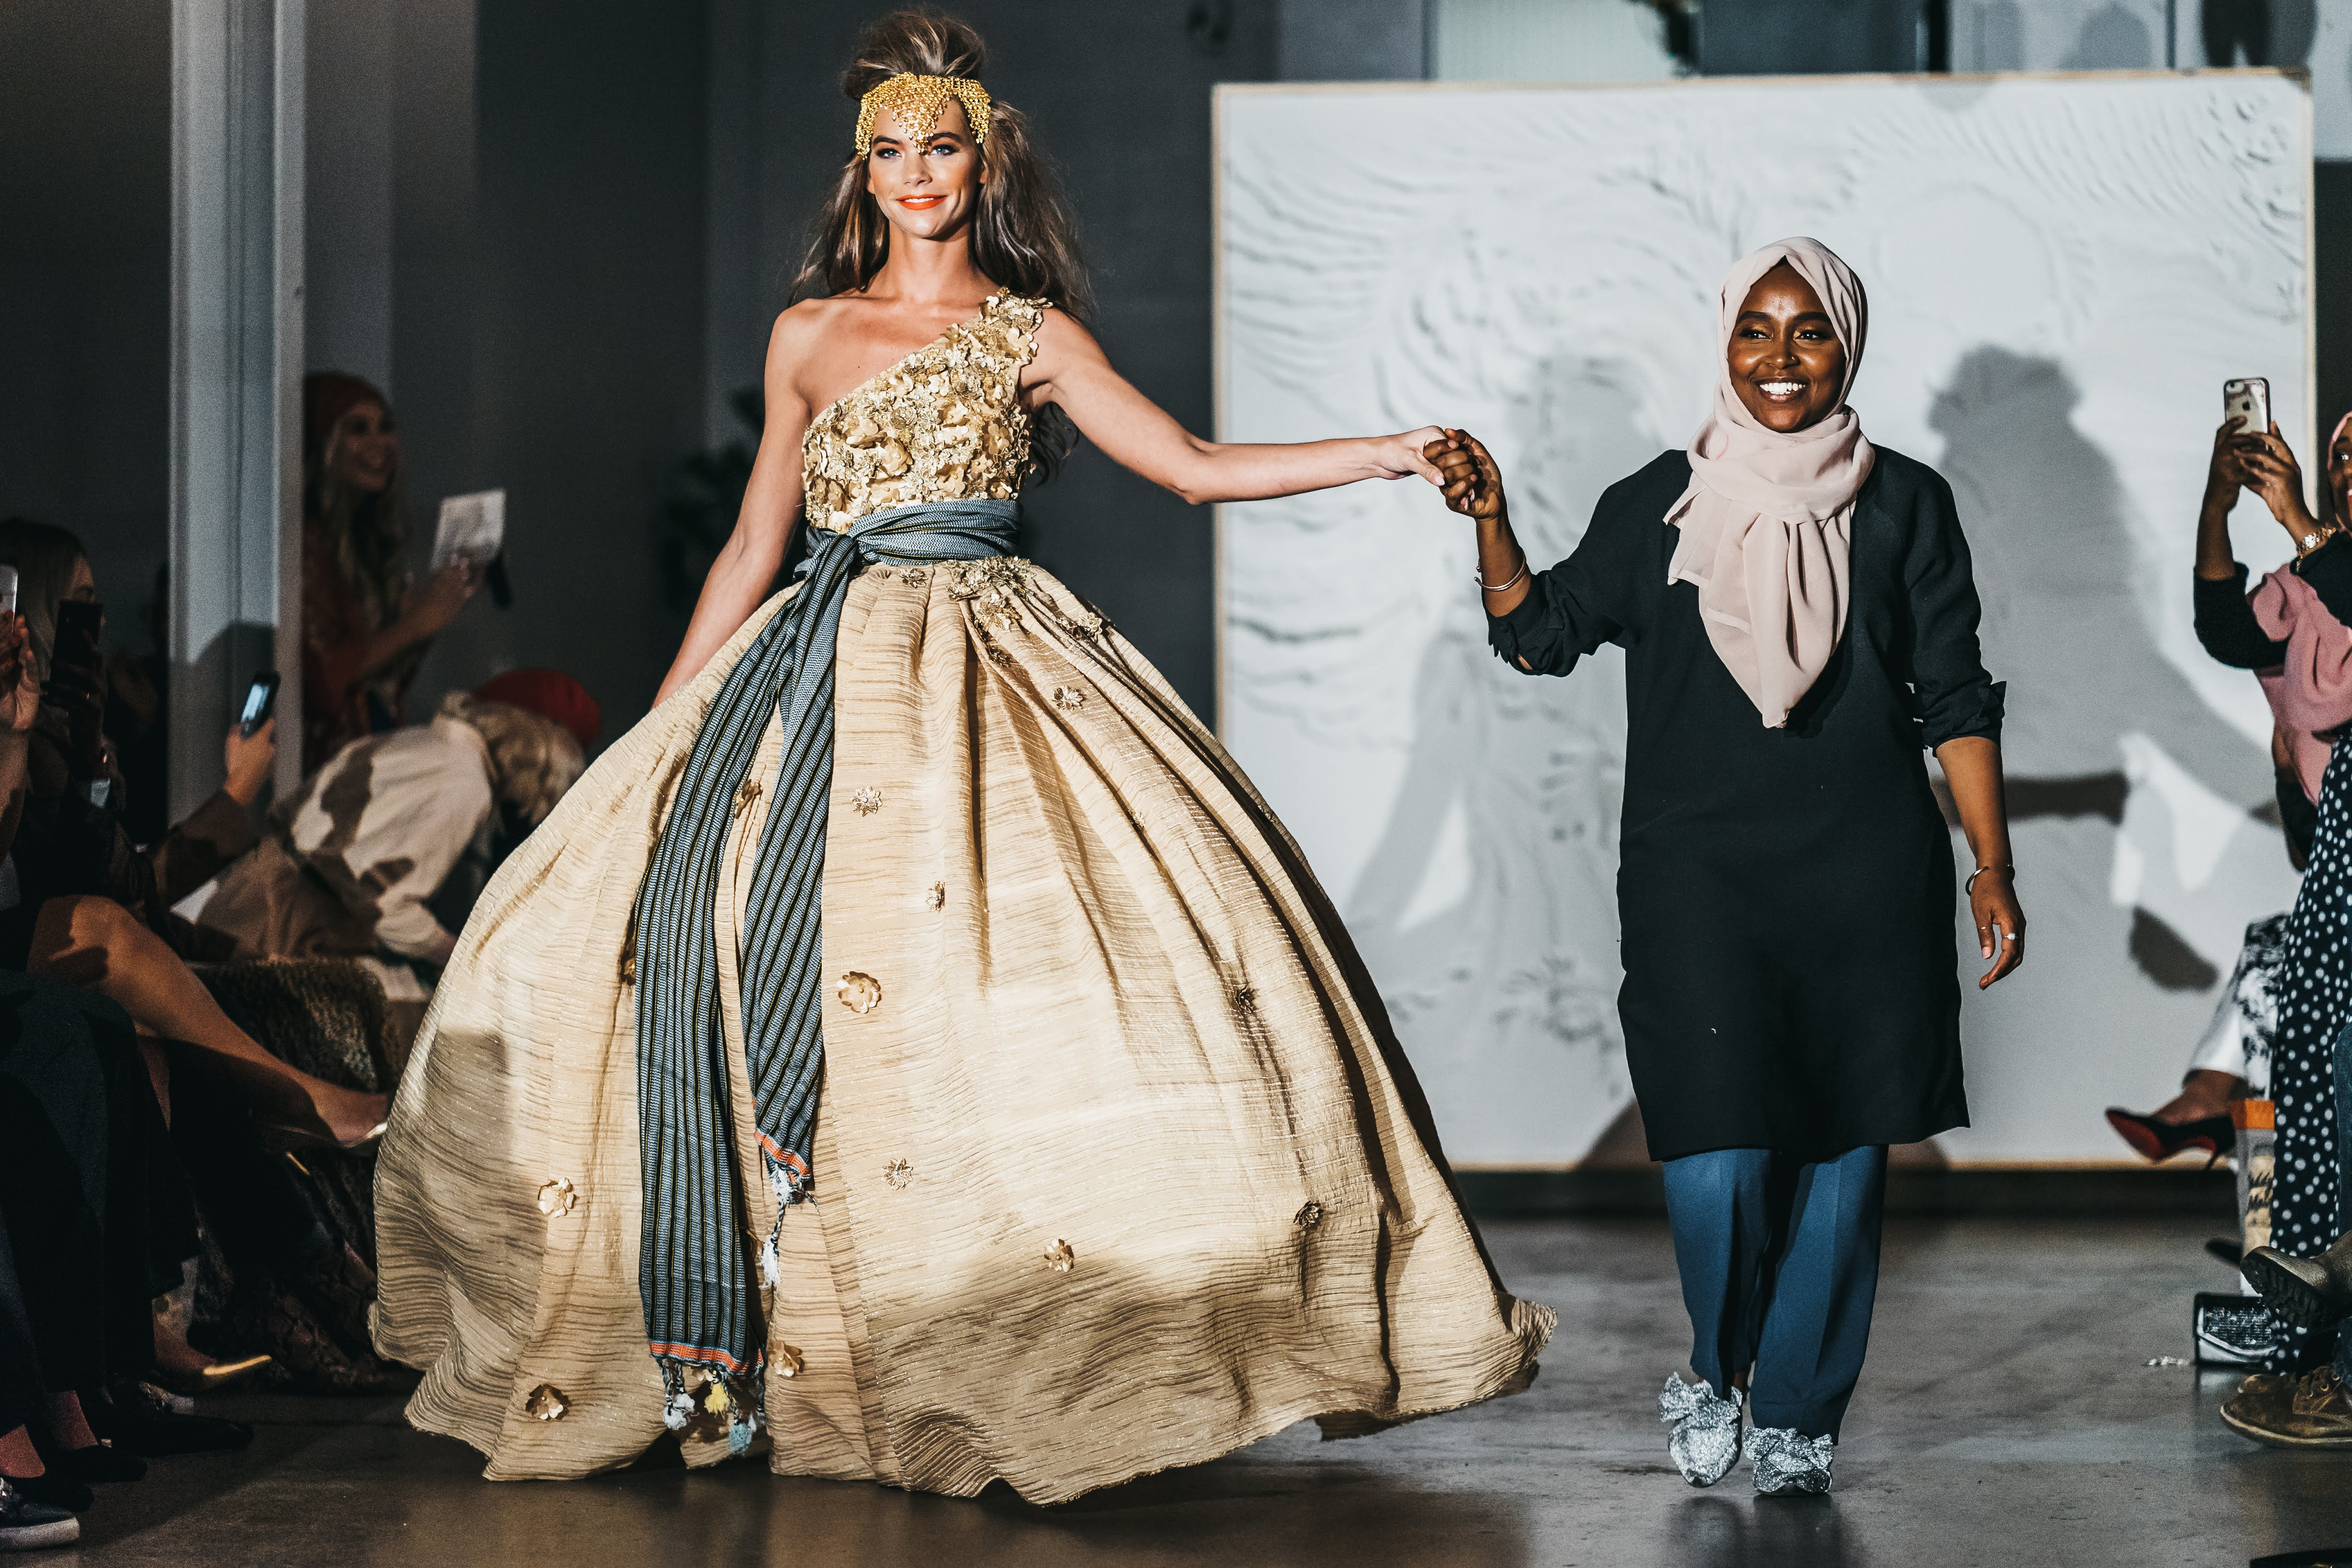 Model Hannah Peltier brings out designer Ramadhan Mohamed at Warm Winter Nights in Finfine